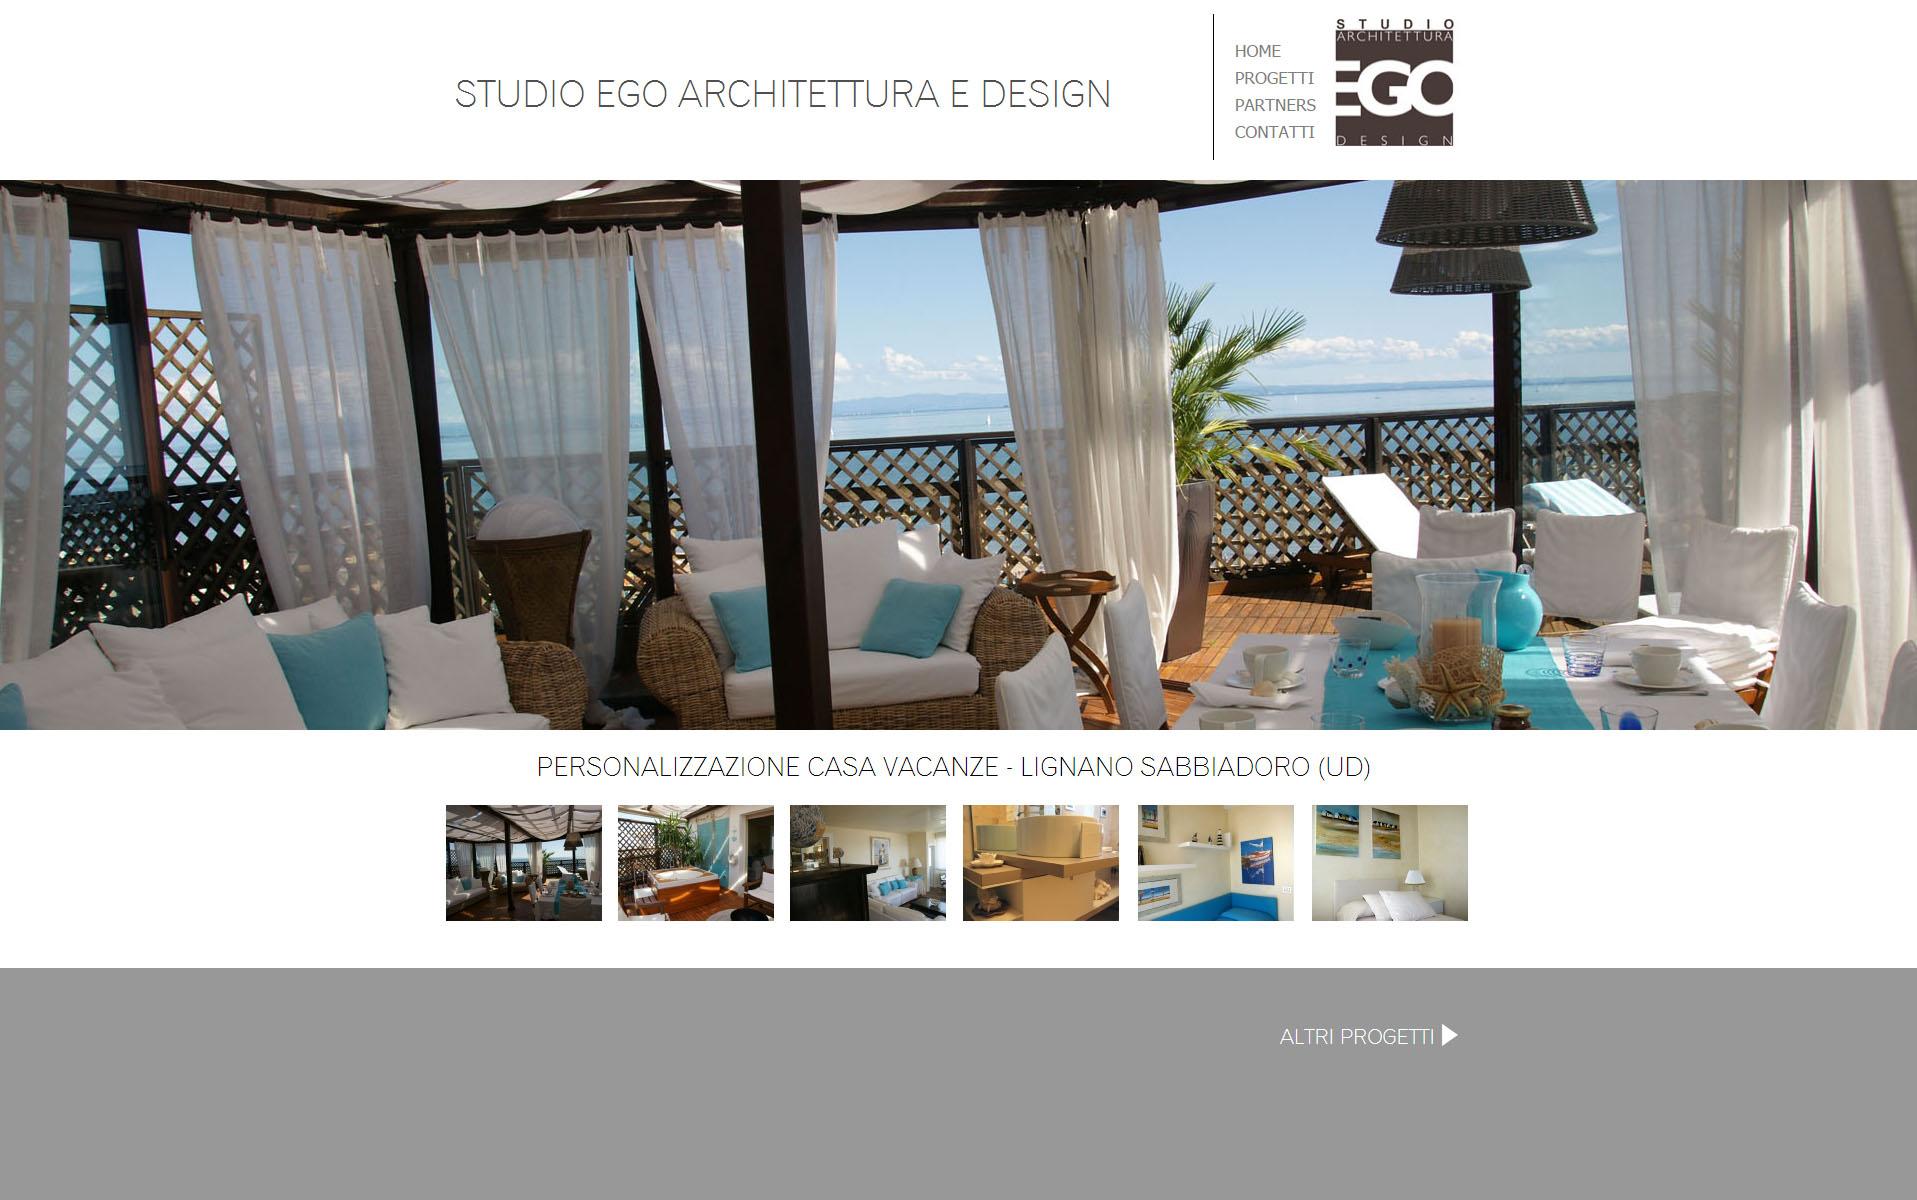 Ego studio architettura